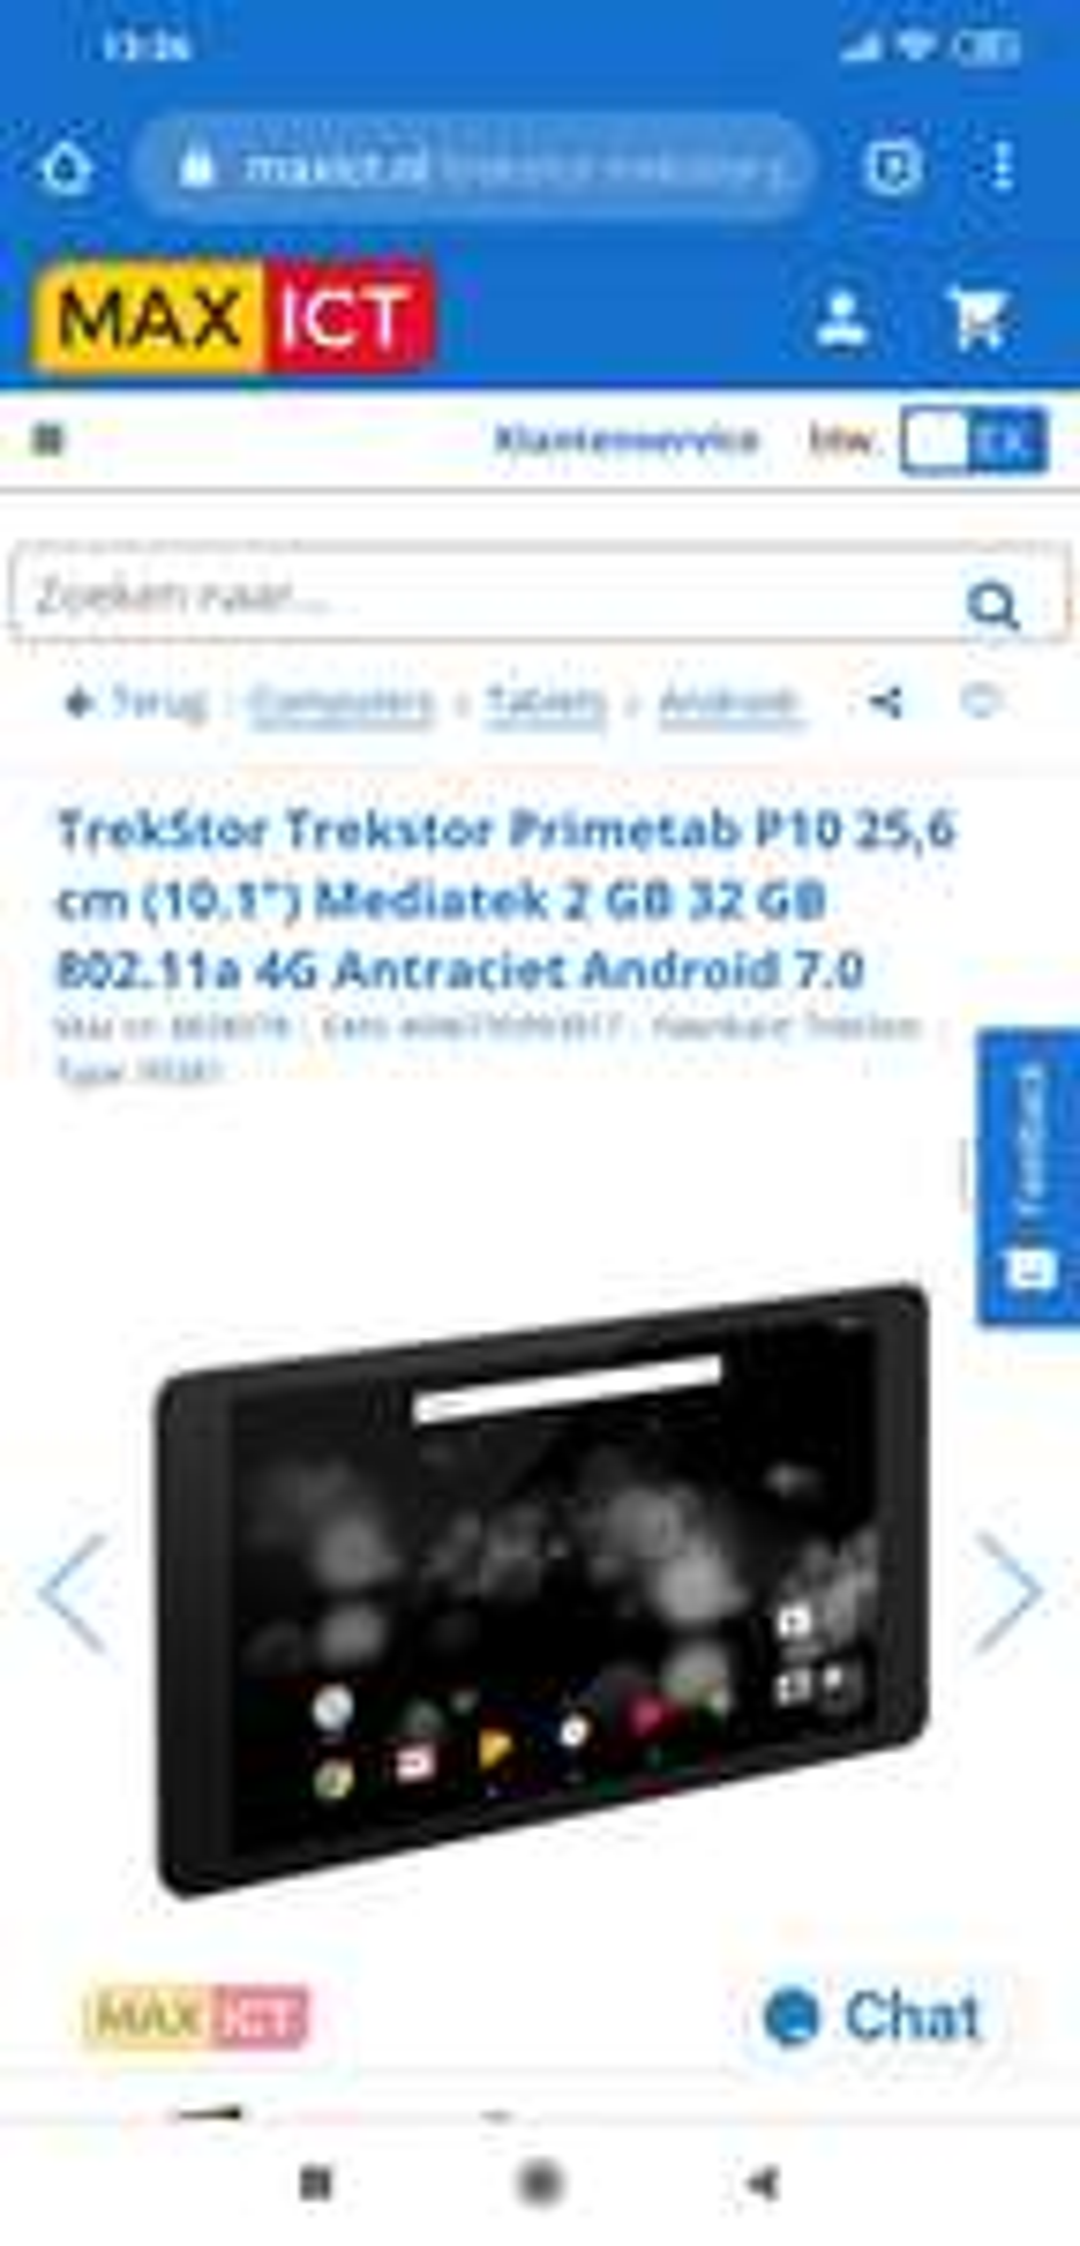 TrekStor Trekstor Primetab P10